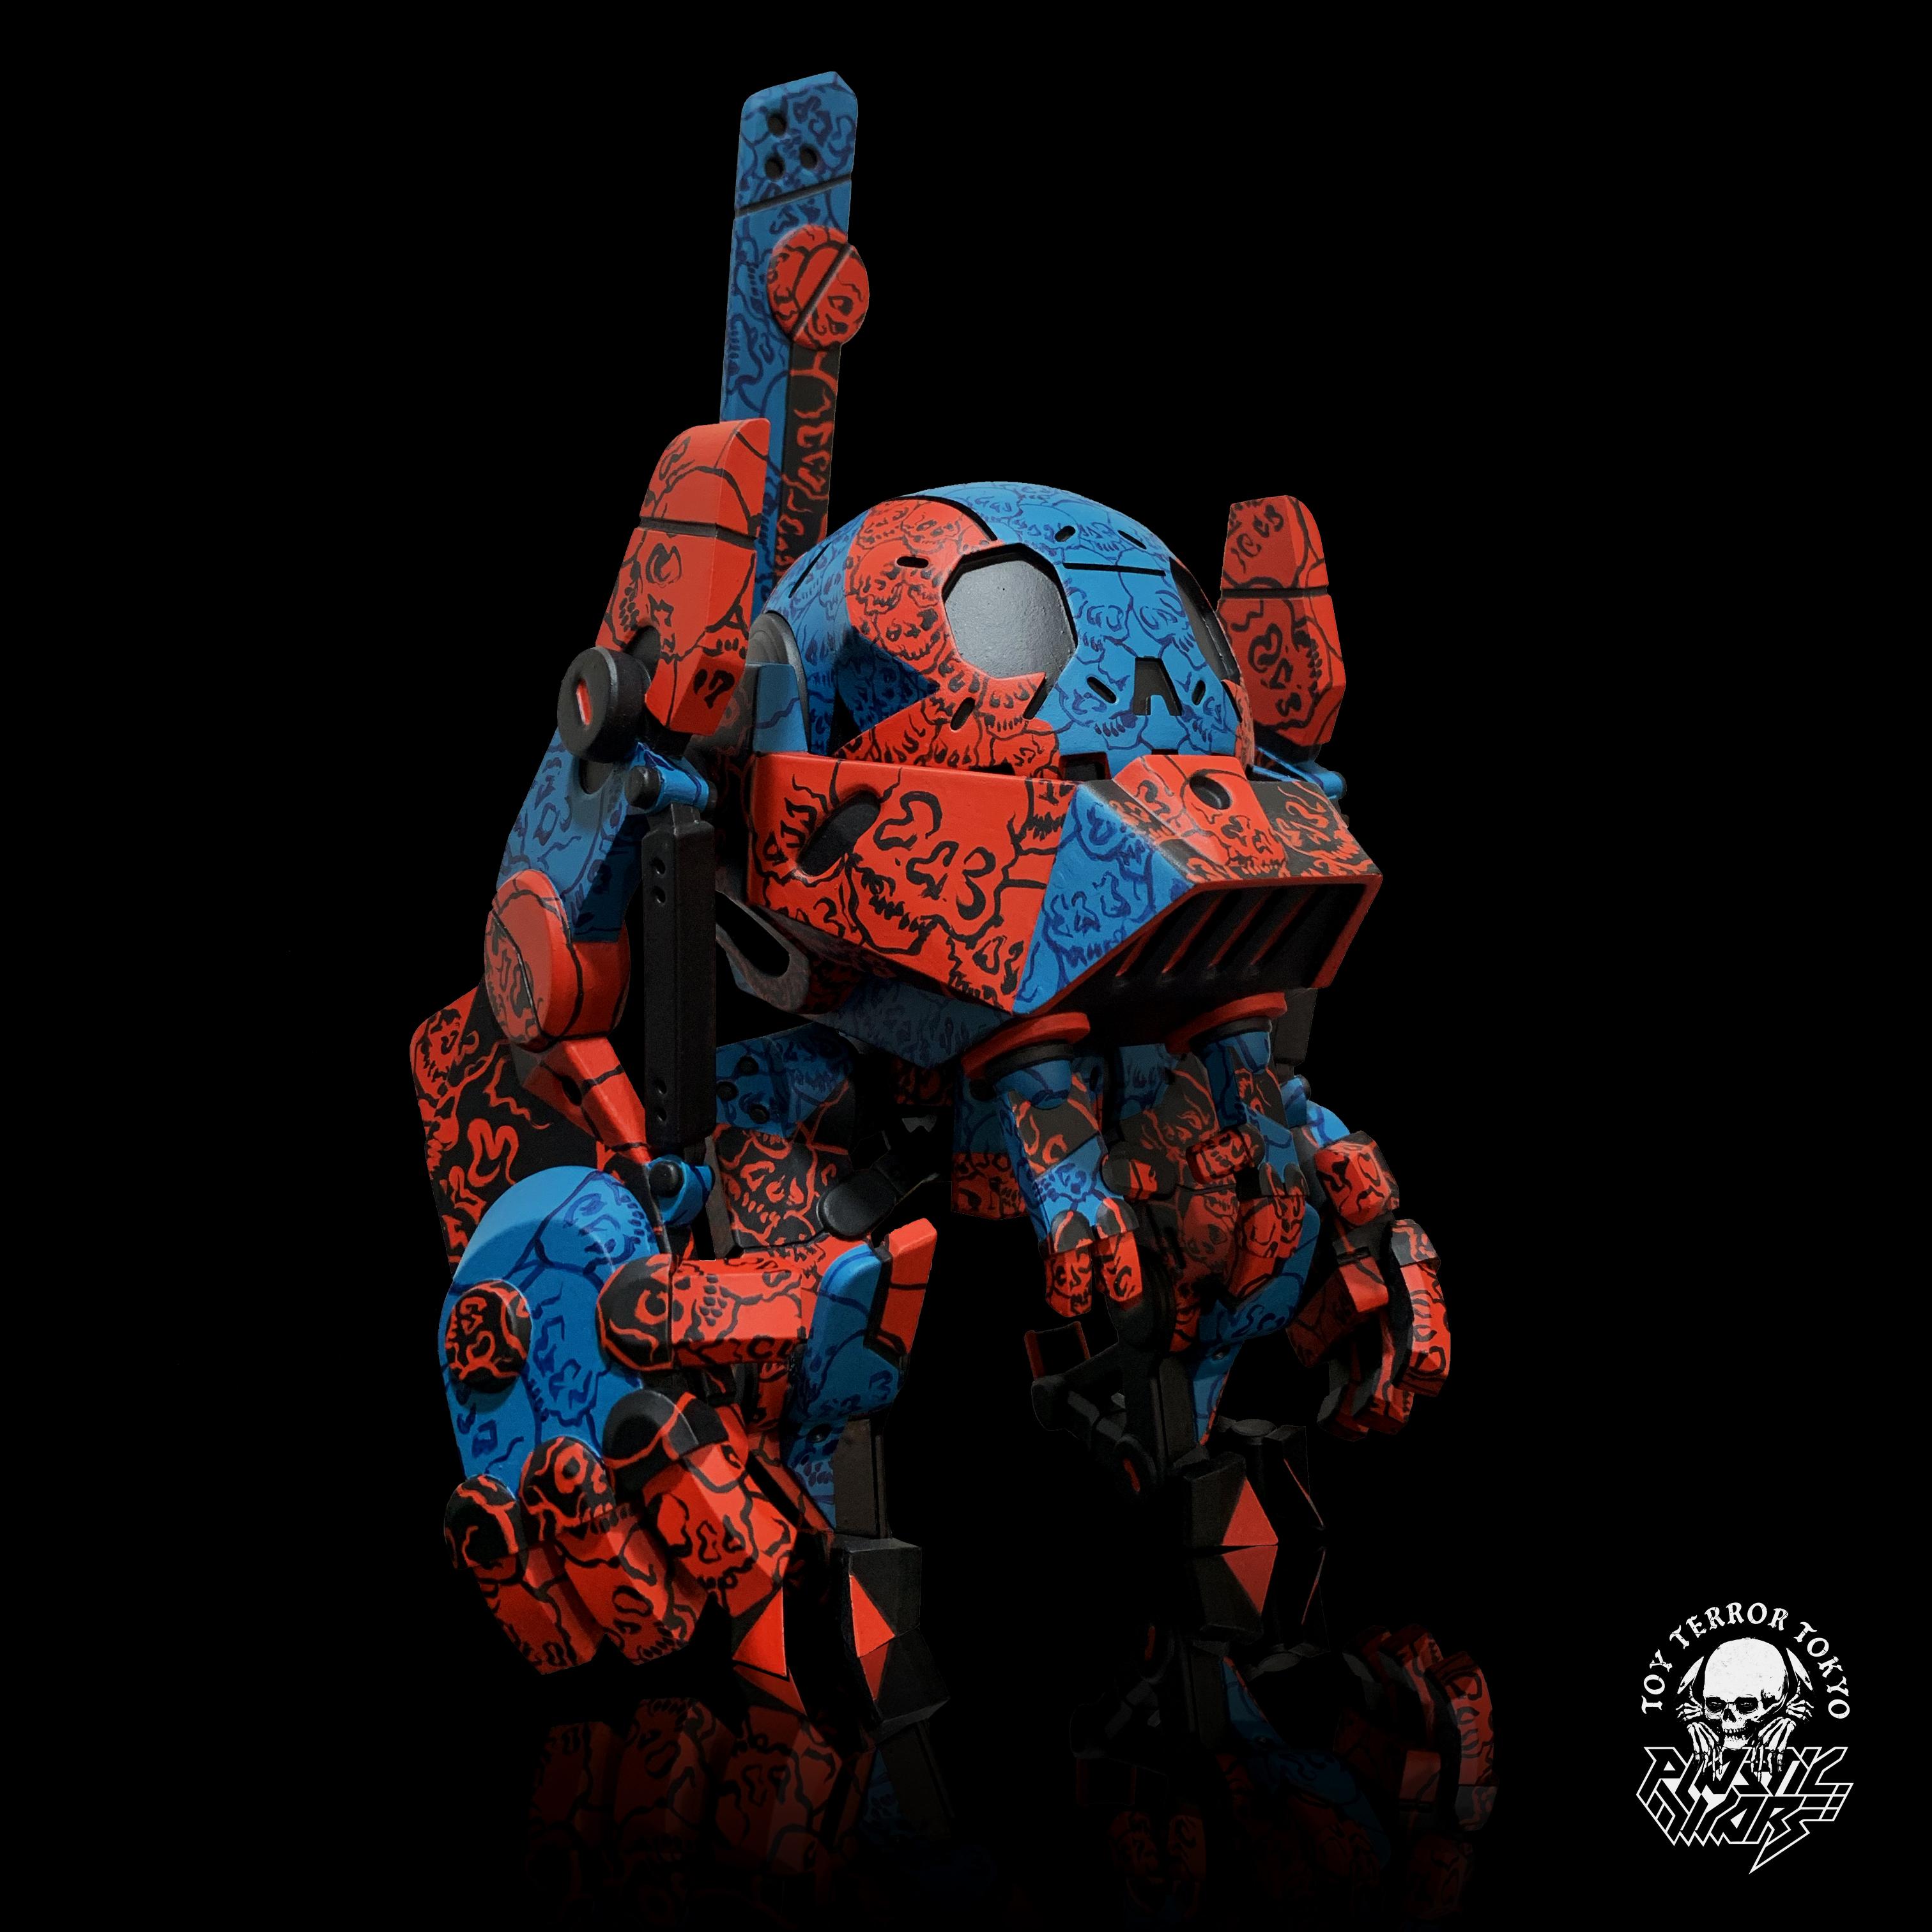 Toy Terror Mechaverita Ghetto Plastic Sadgas Beast Brothers